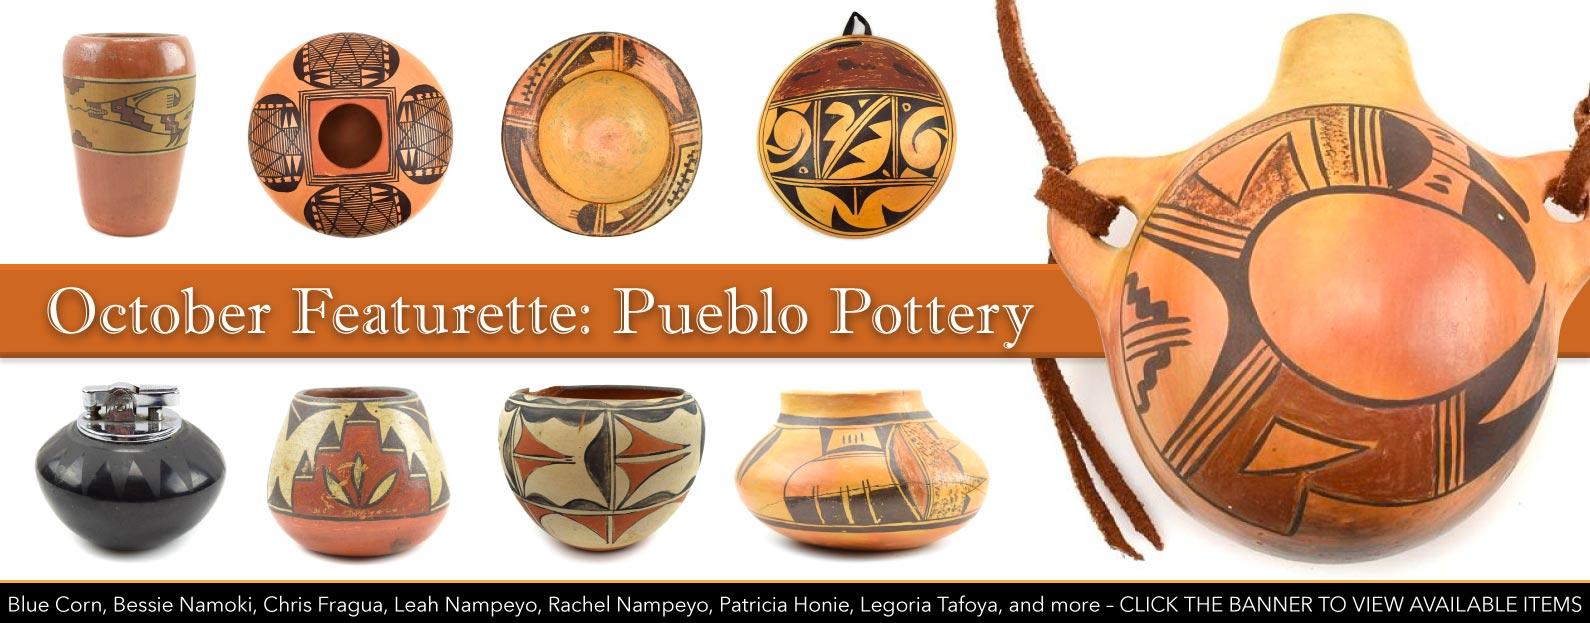 October Featurette: Pueblo Pottery